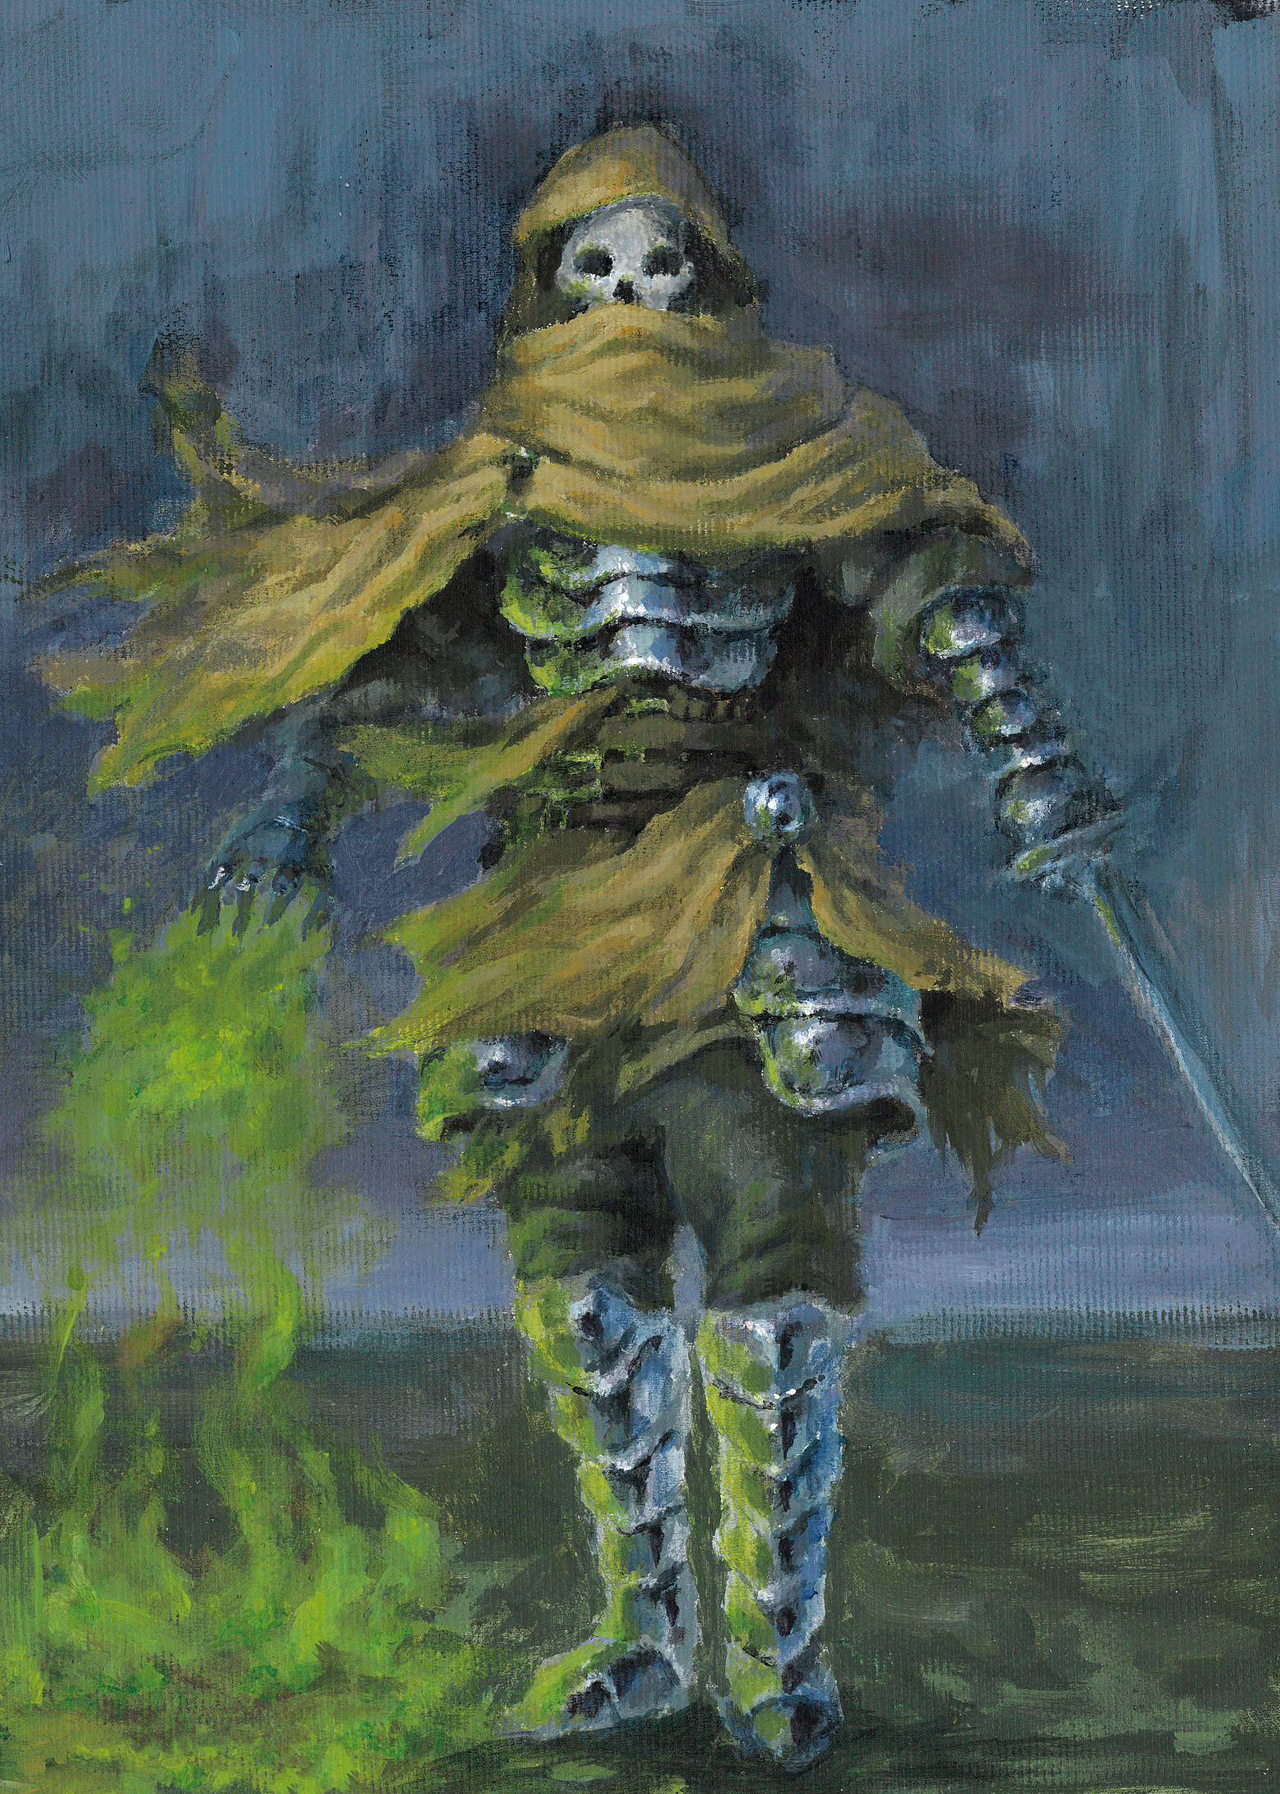 [Image: wraith_of_pestilence_by_adzerak_dcuqjr1-...hxZd2GHxLM]